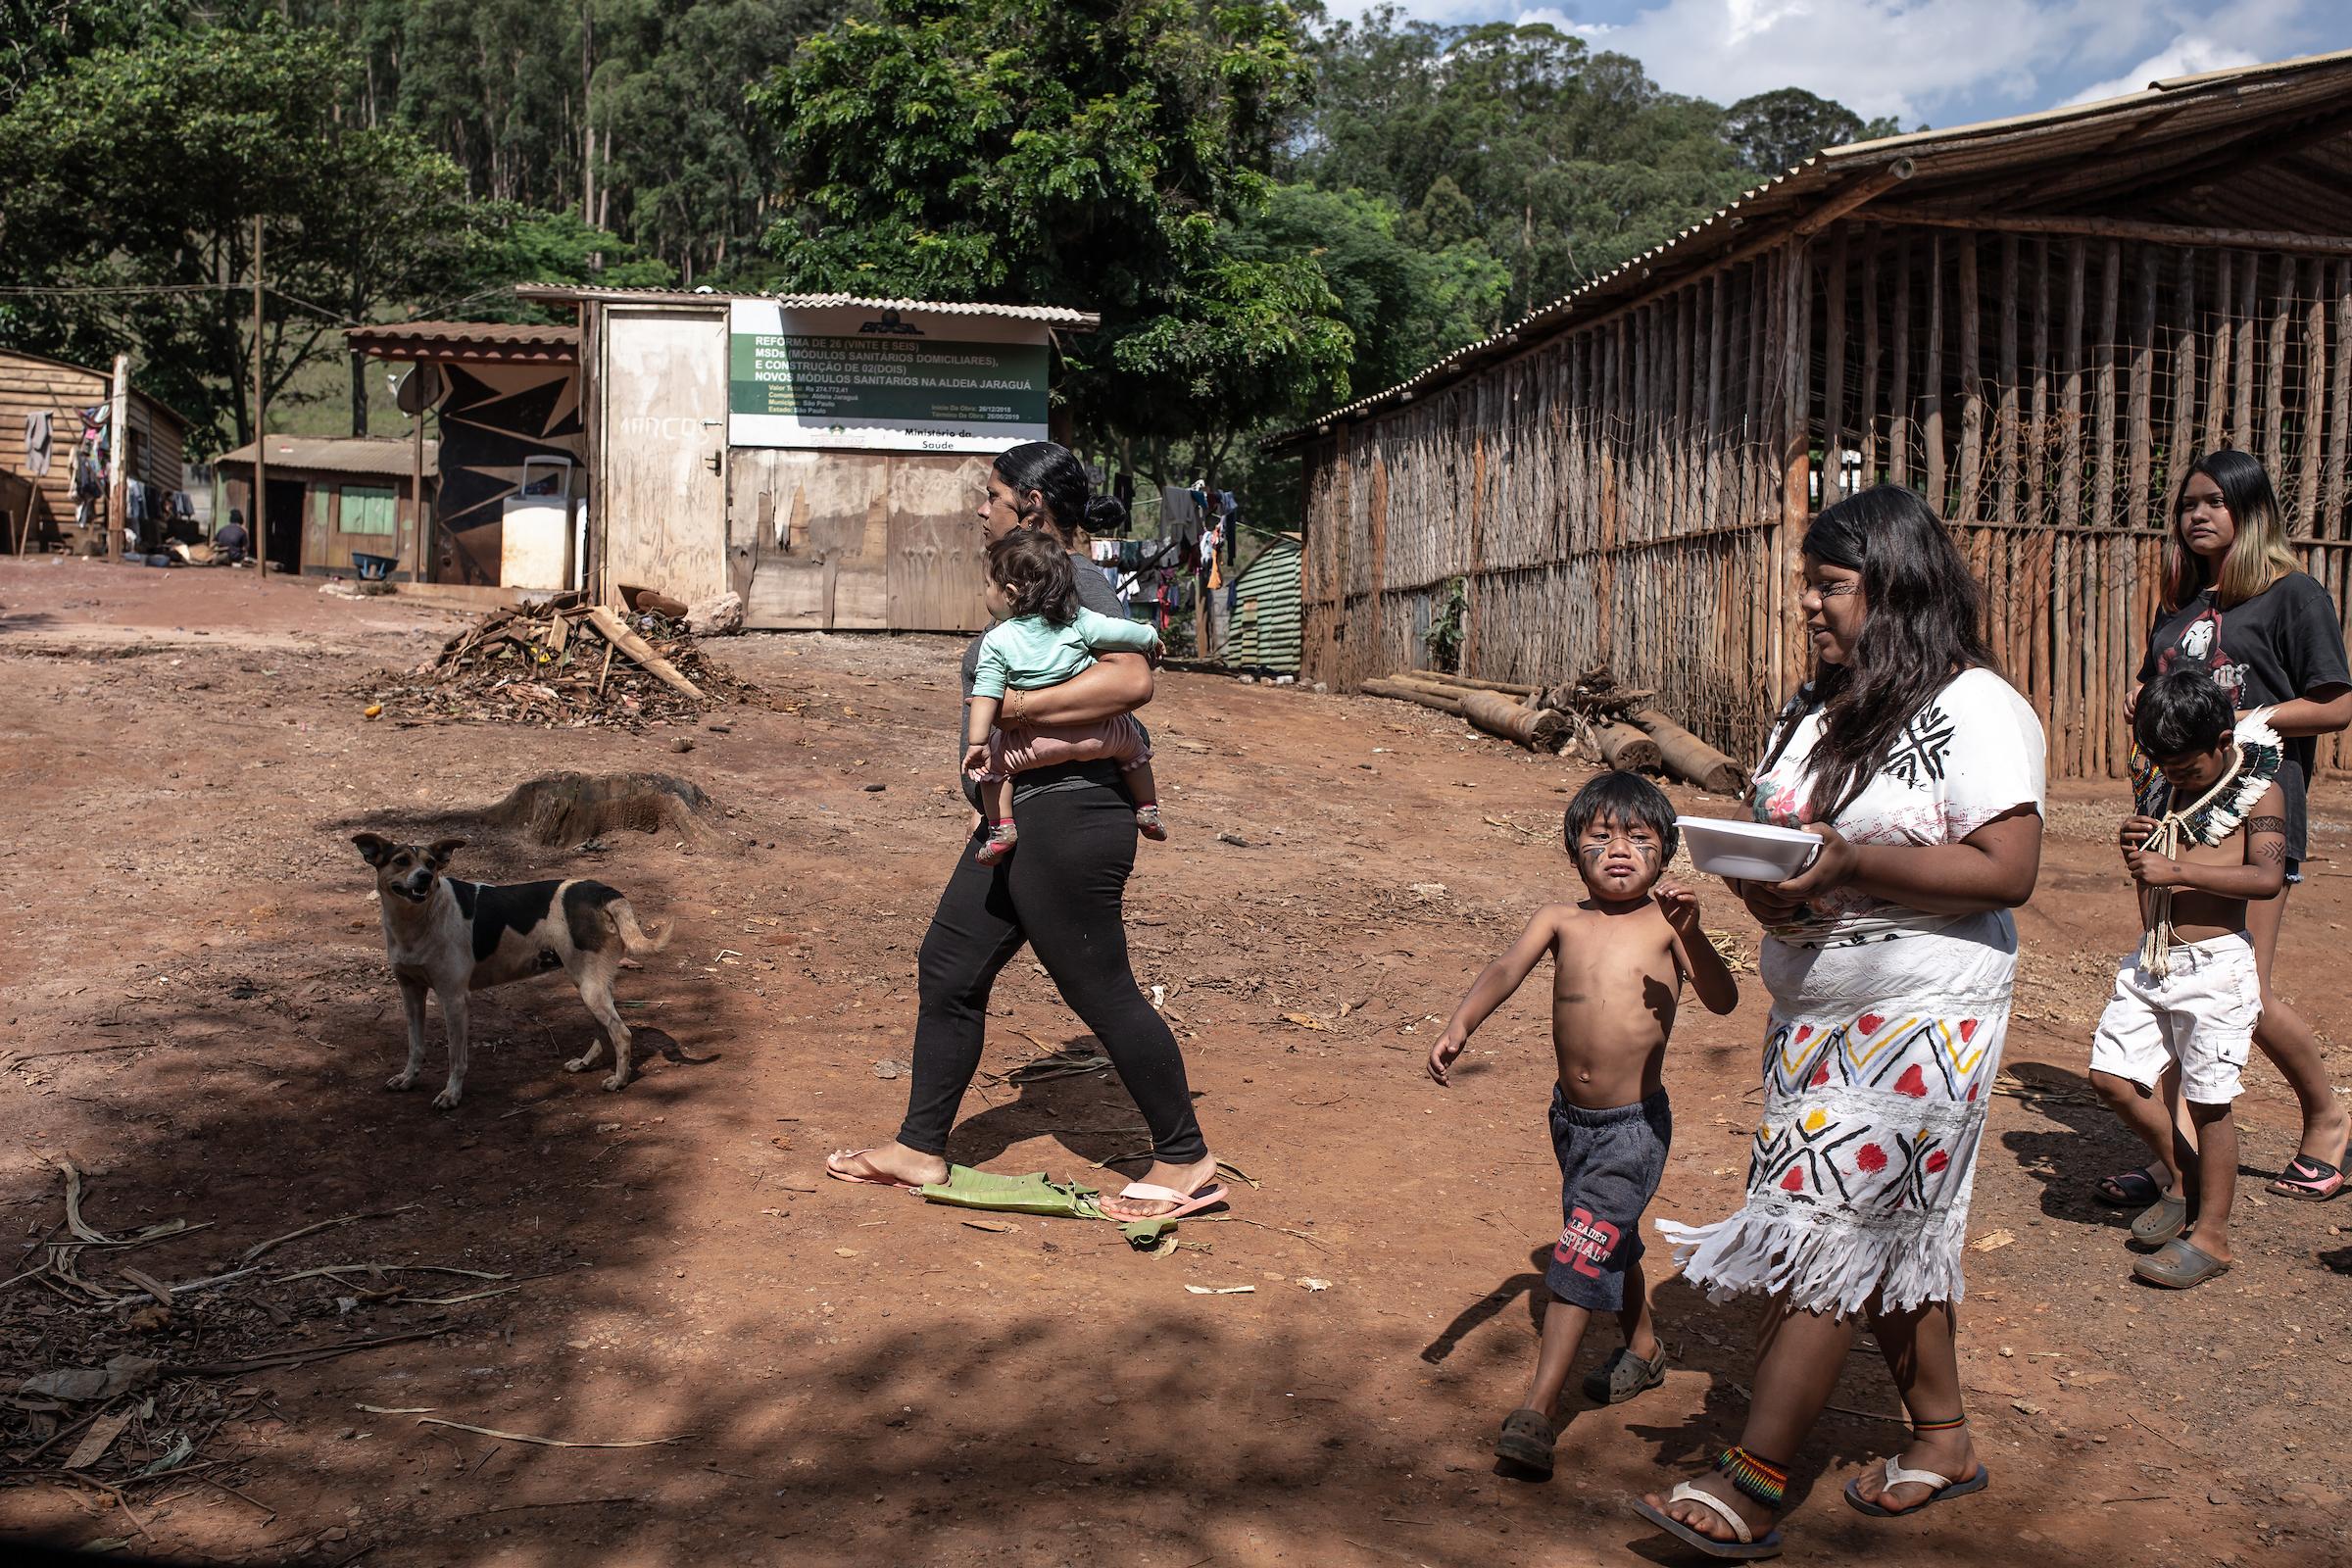 Adults and children walk through a village.